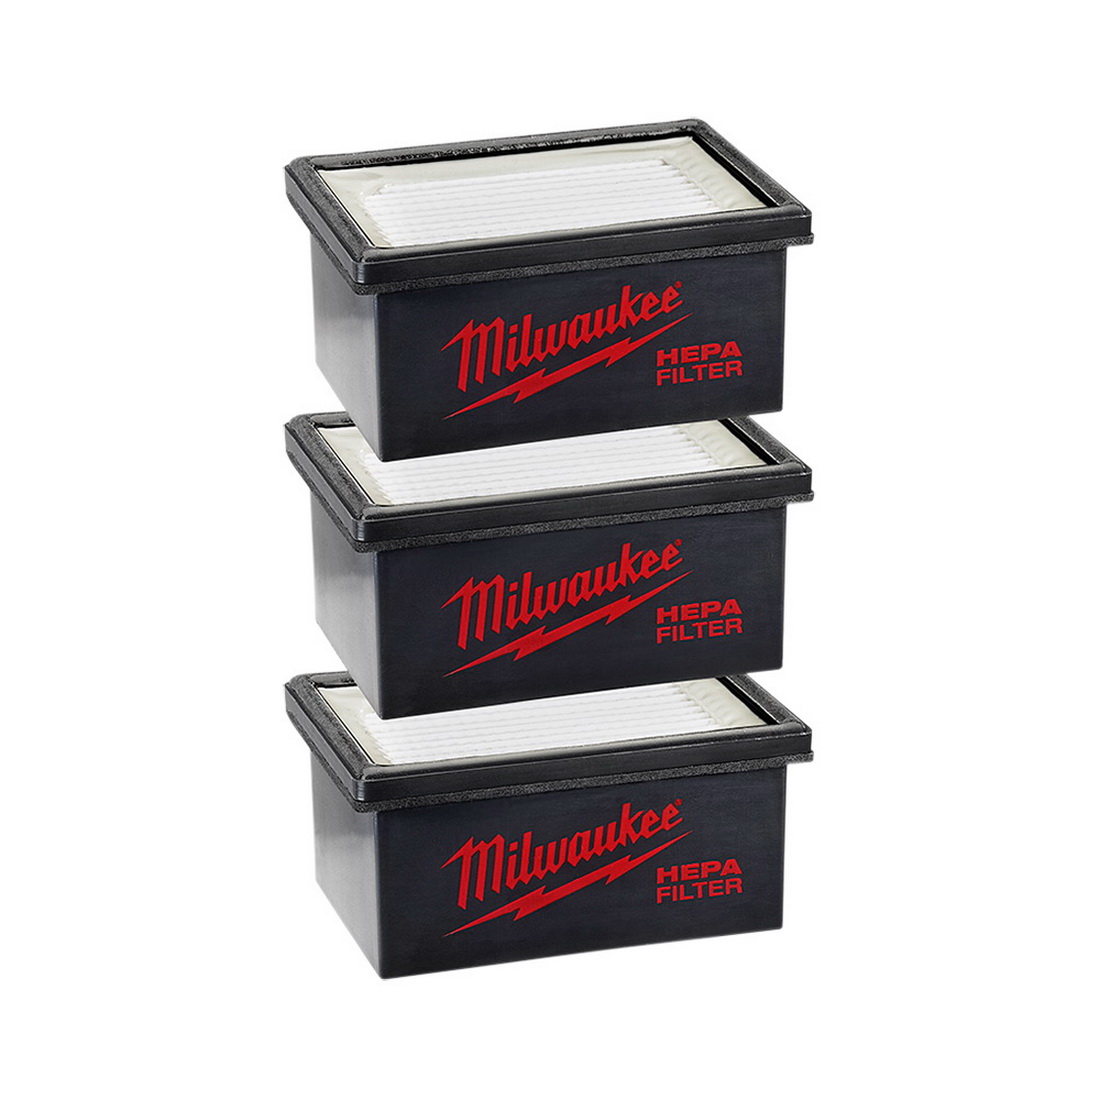 HAMMERVAC Filter 3 Pack